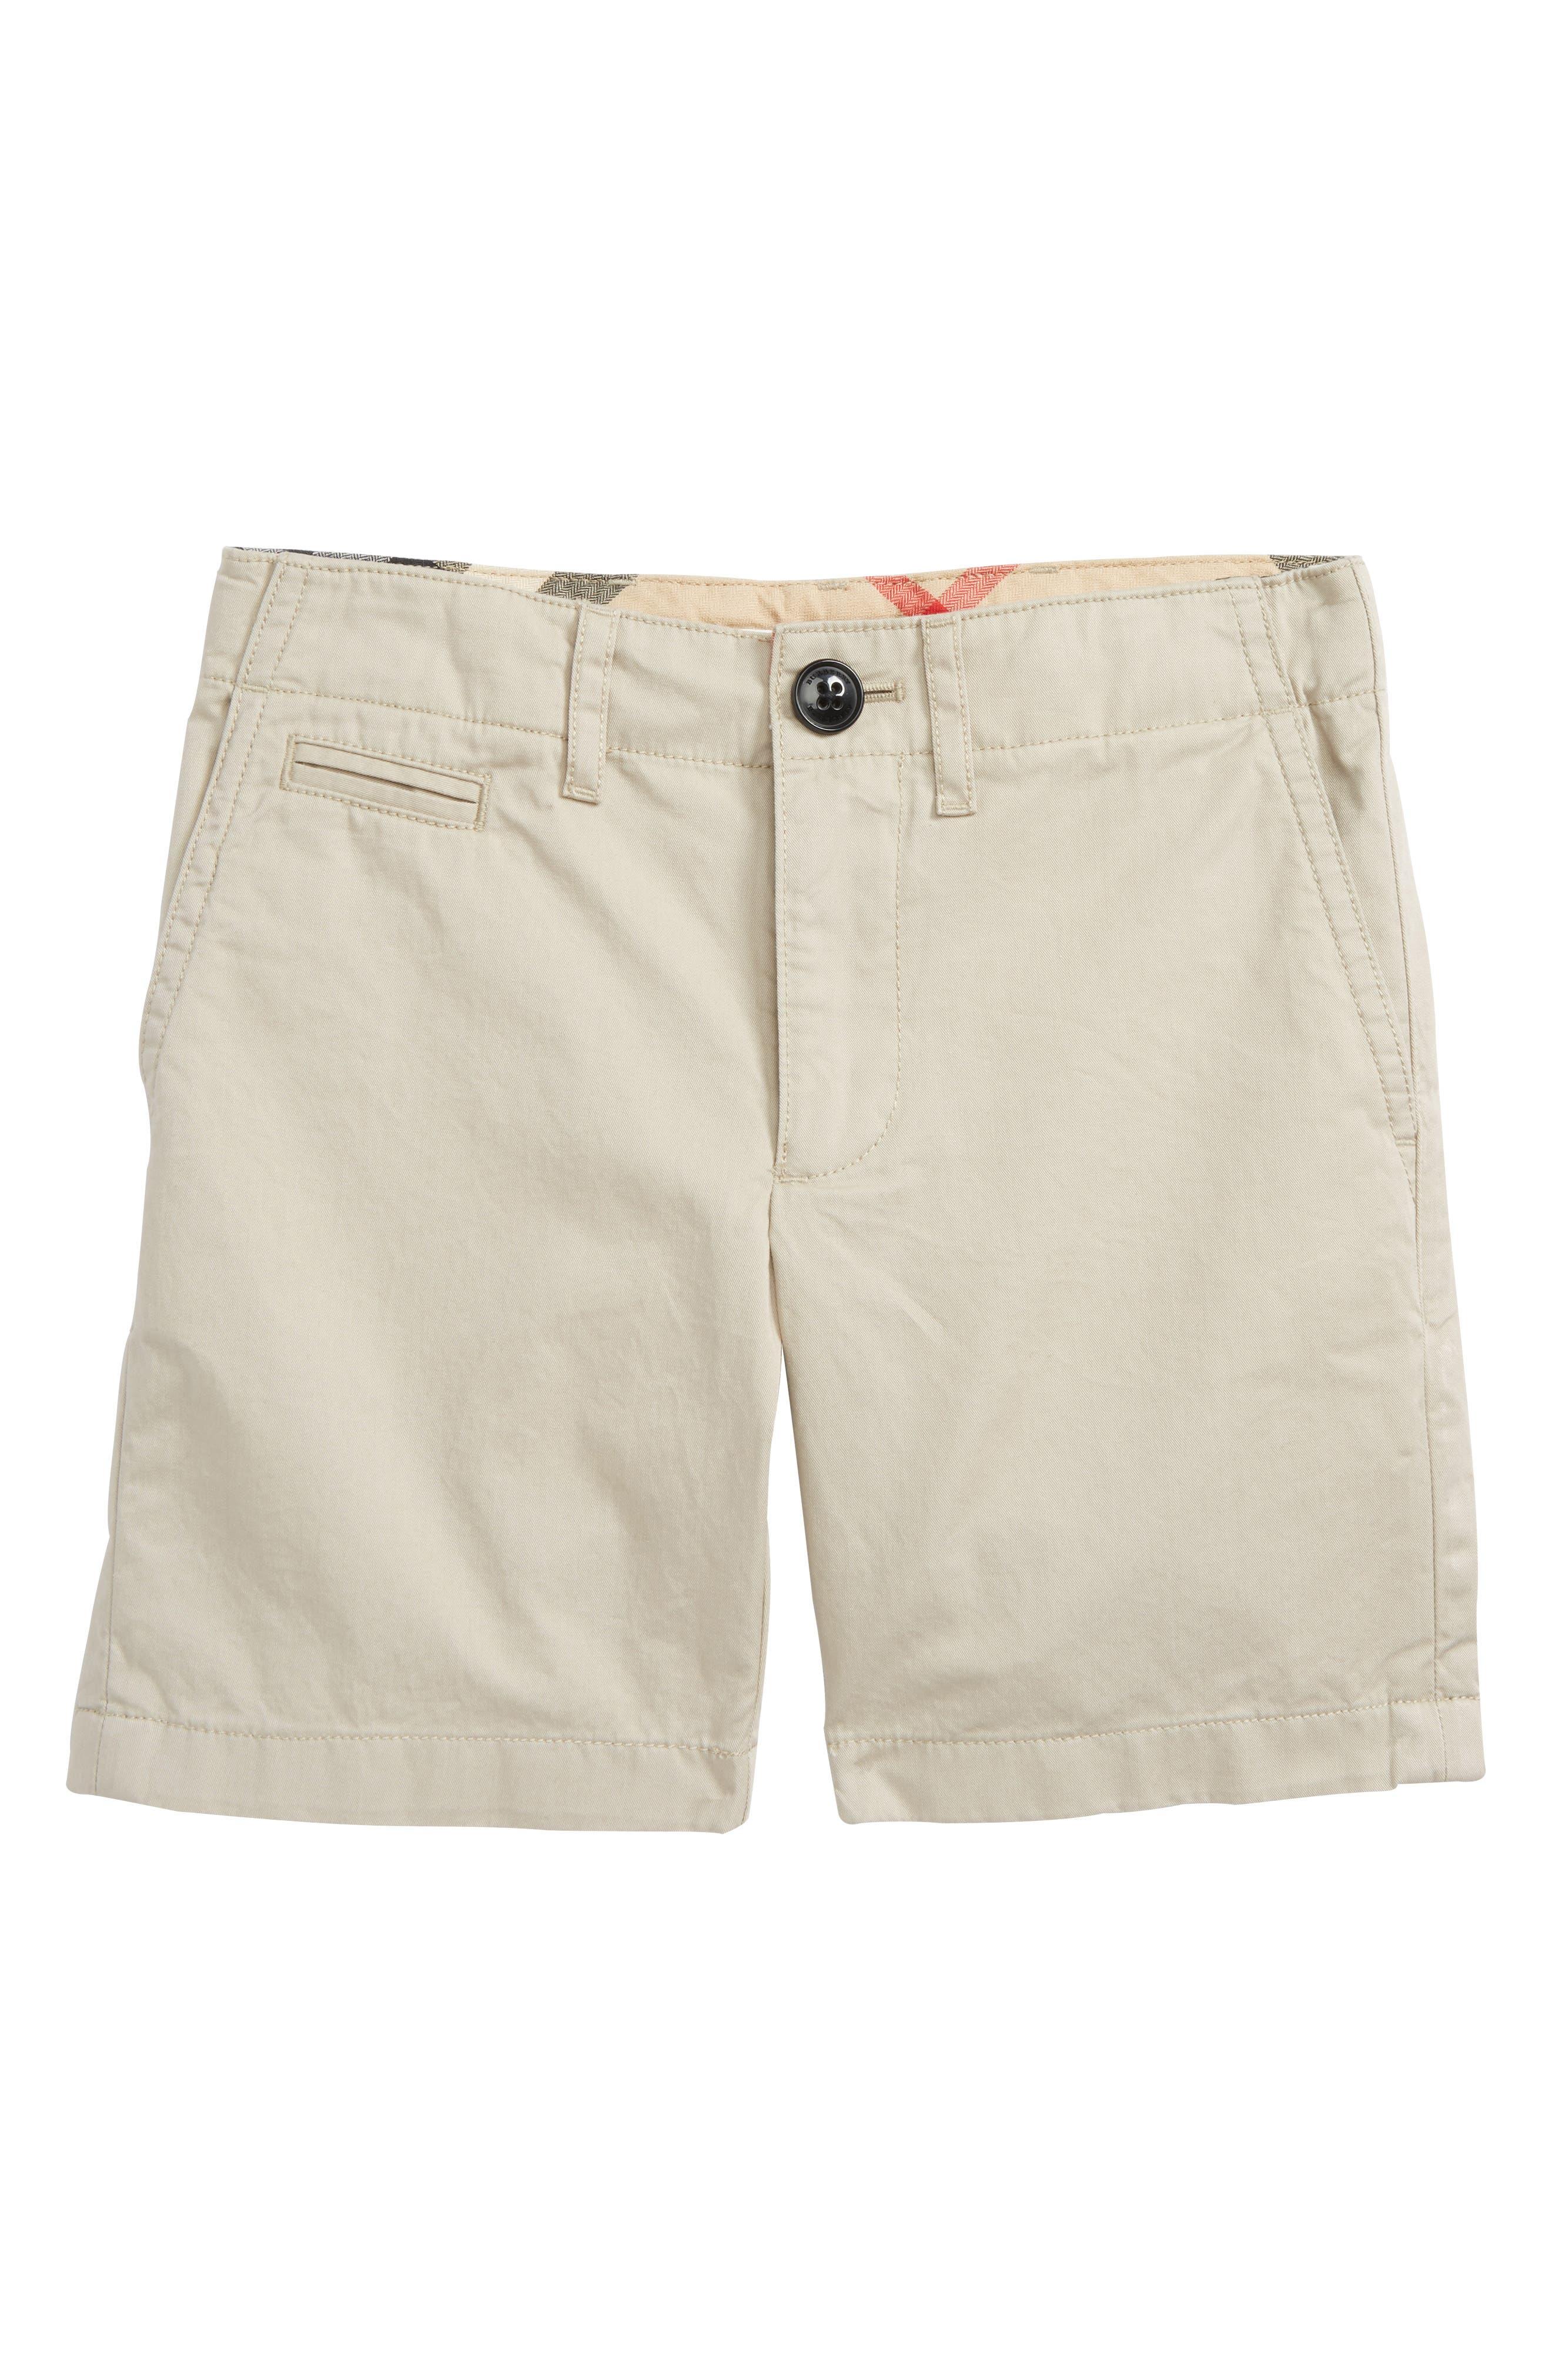 Tristen Shorts,                             Main thumbnail 1, color,                             028